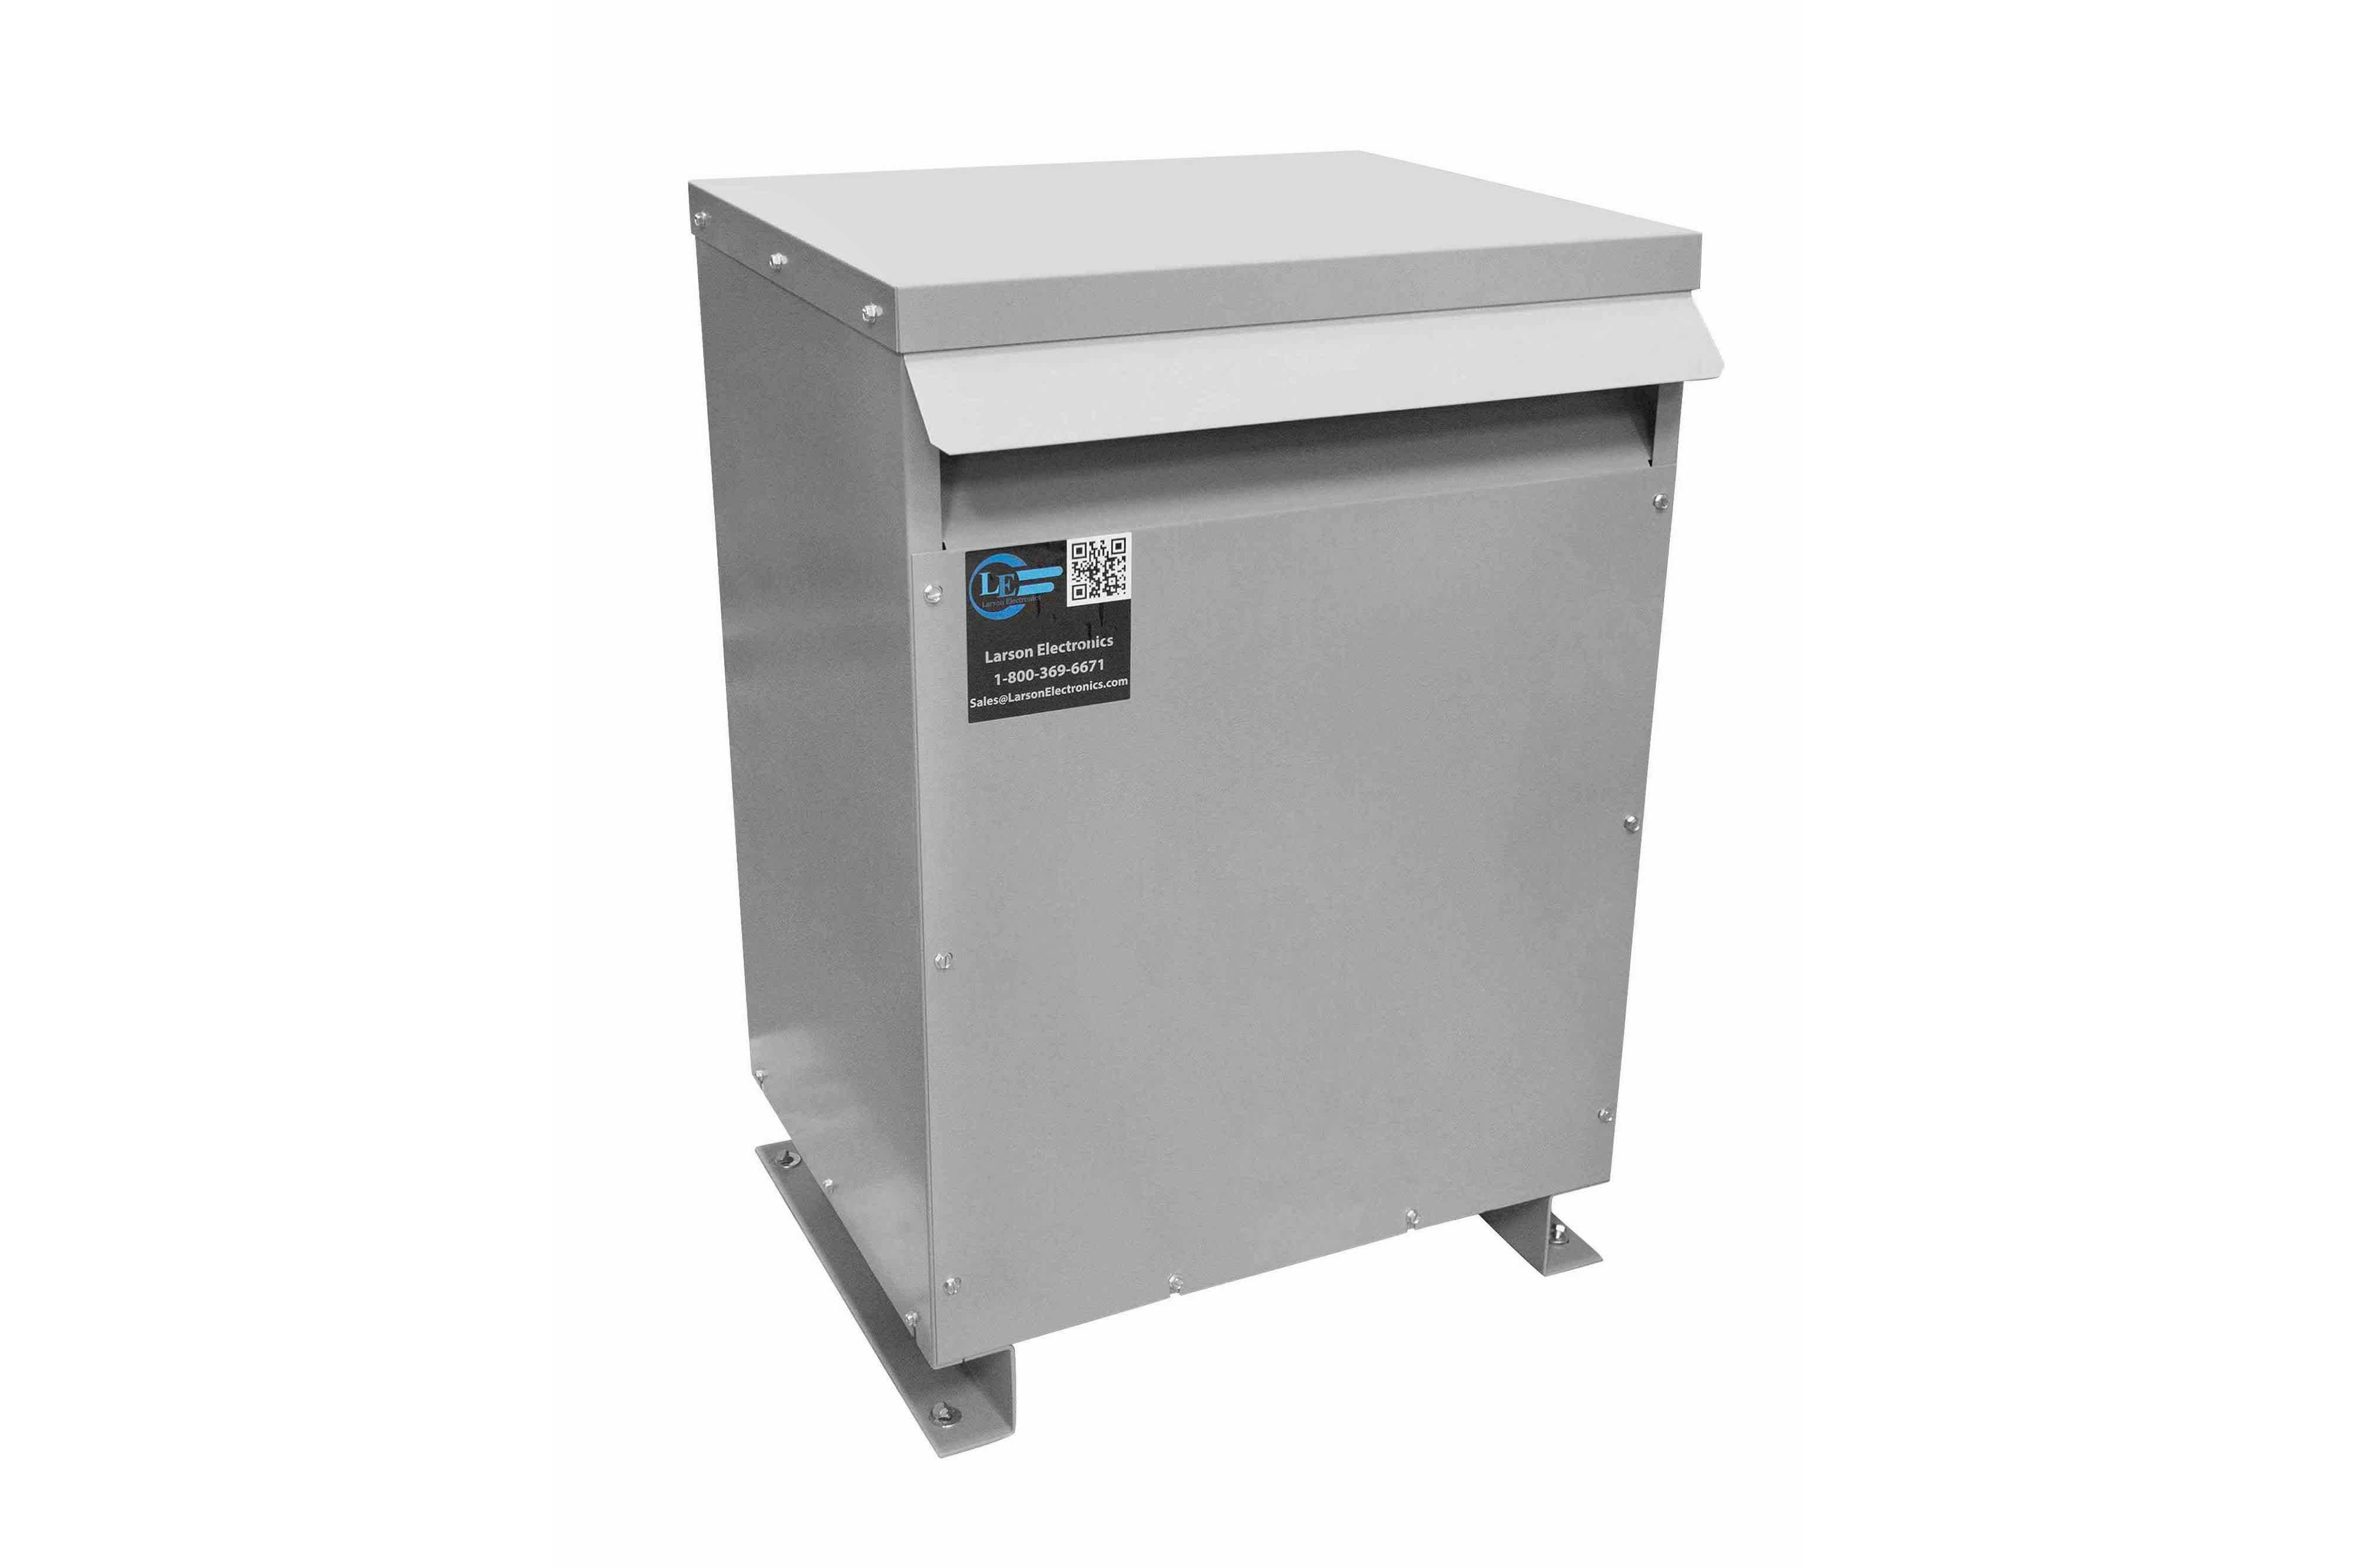 22.5 kVA 3PH Isolation Transformer, 400V Wye Primary, 480Y/277 Wye-N Secondary, N3R, Ventilated, 60 Hz